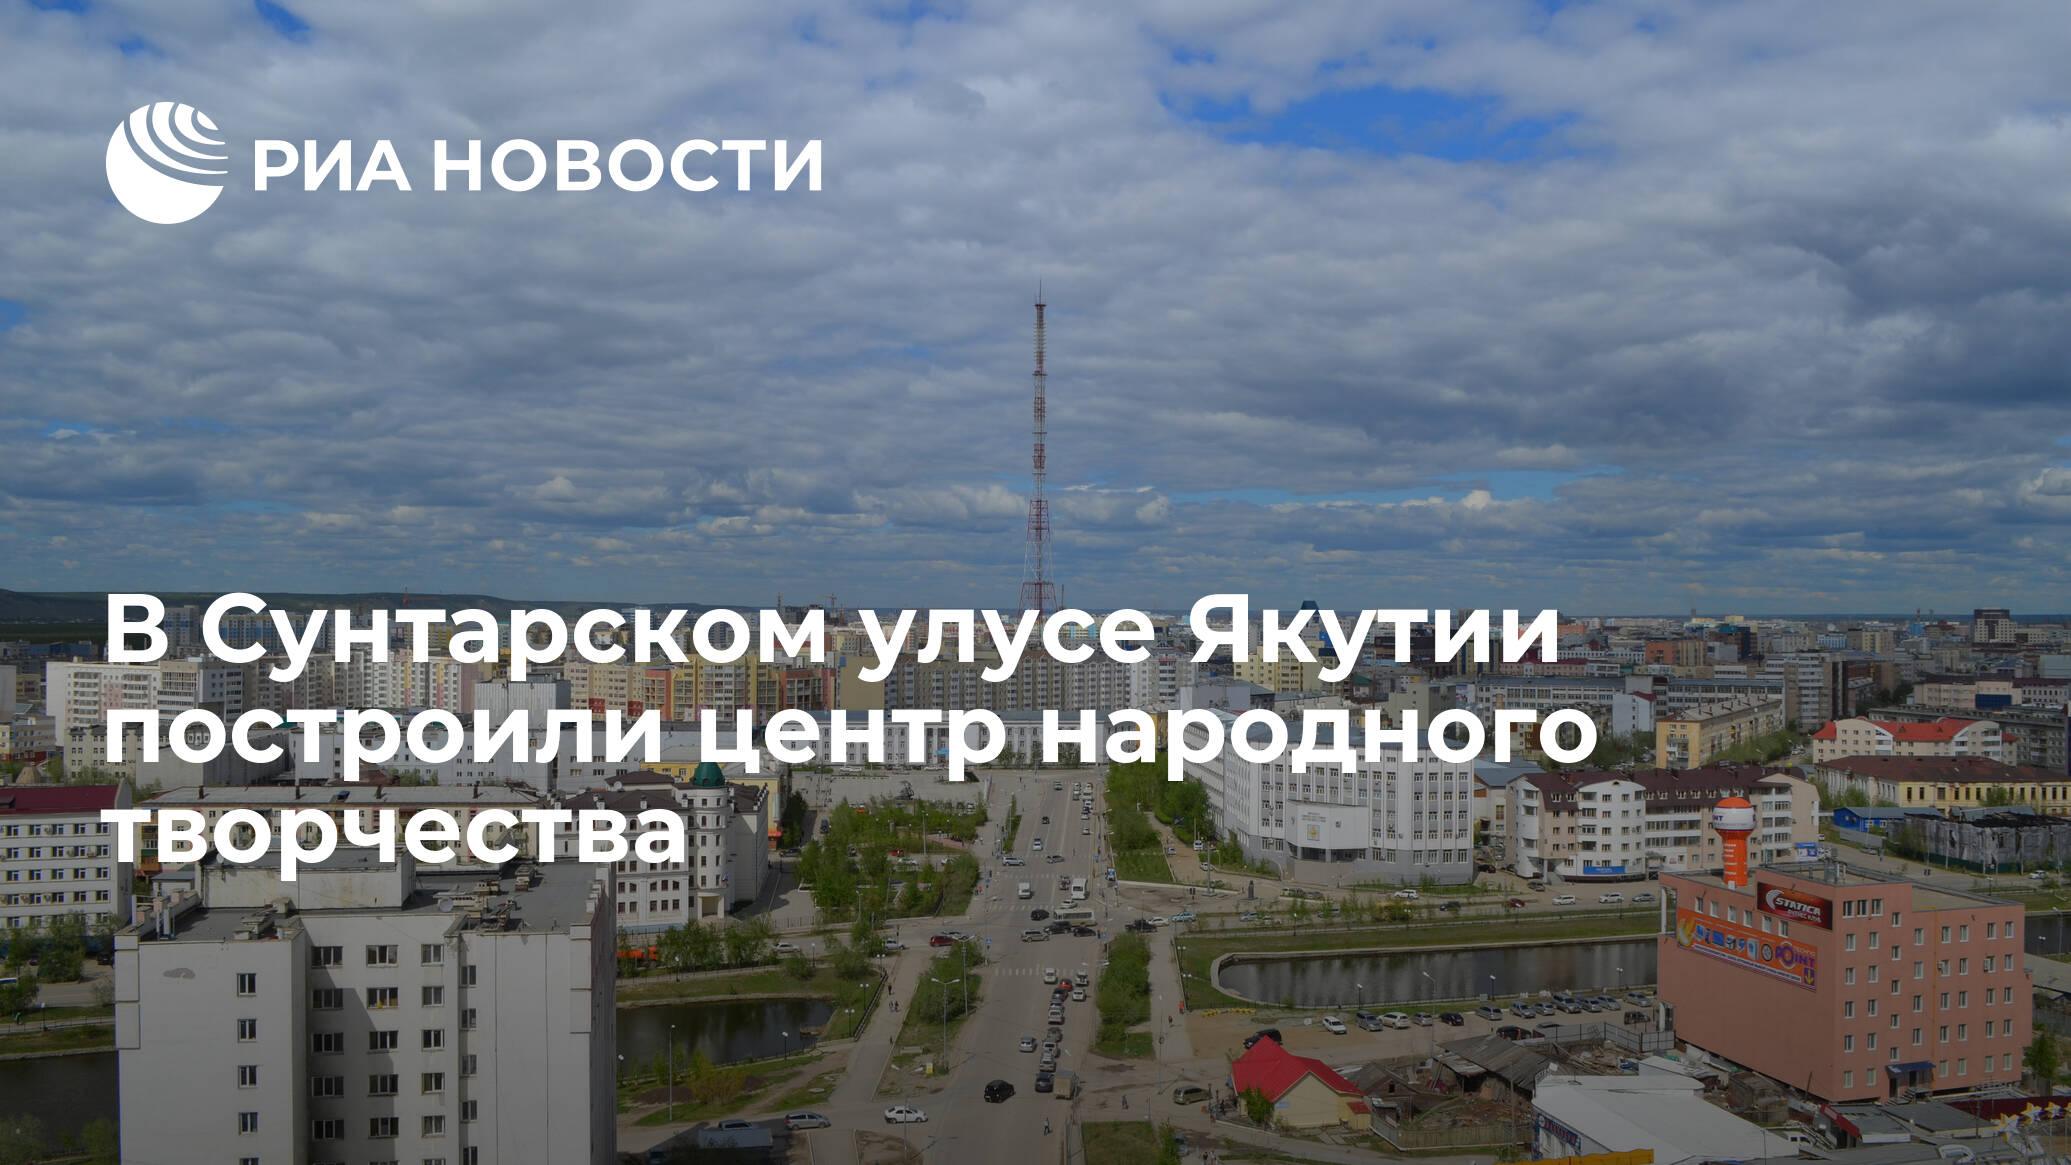 В Сунтарском улусе Якутии построили центр народного ...